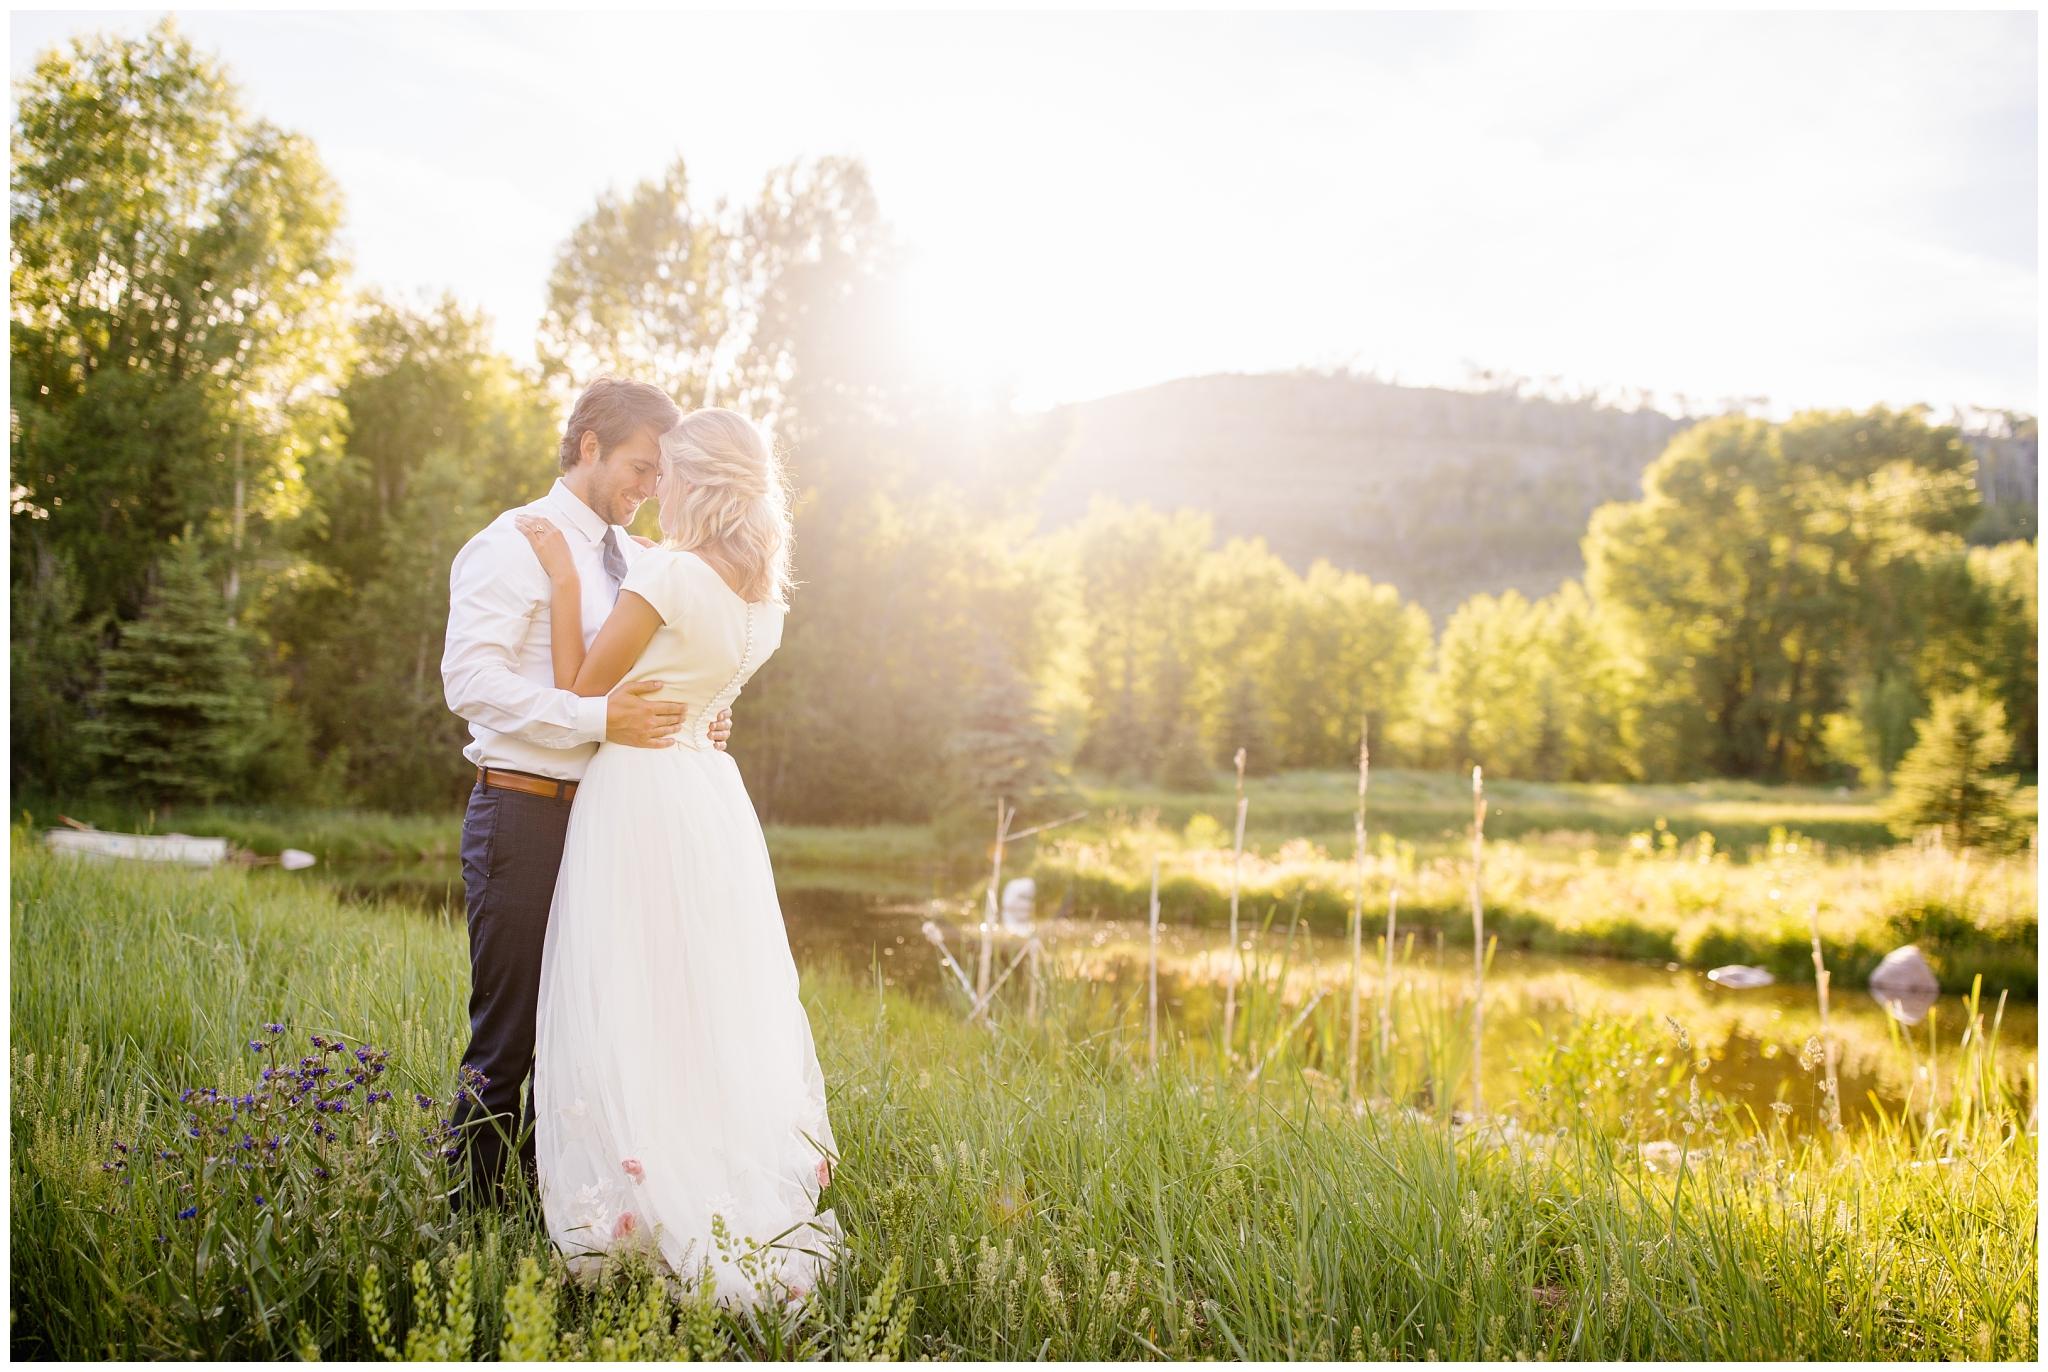 Lizzie-B-Imagery-Utah-Wedding-Photographer-Park-City-Photographer_0039.jpg